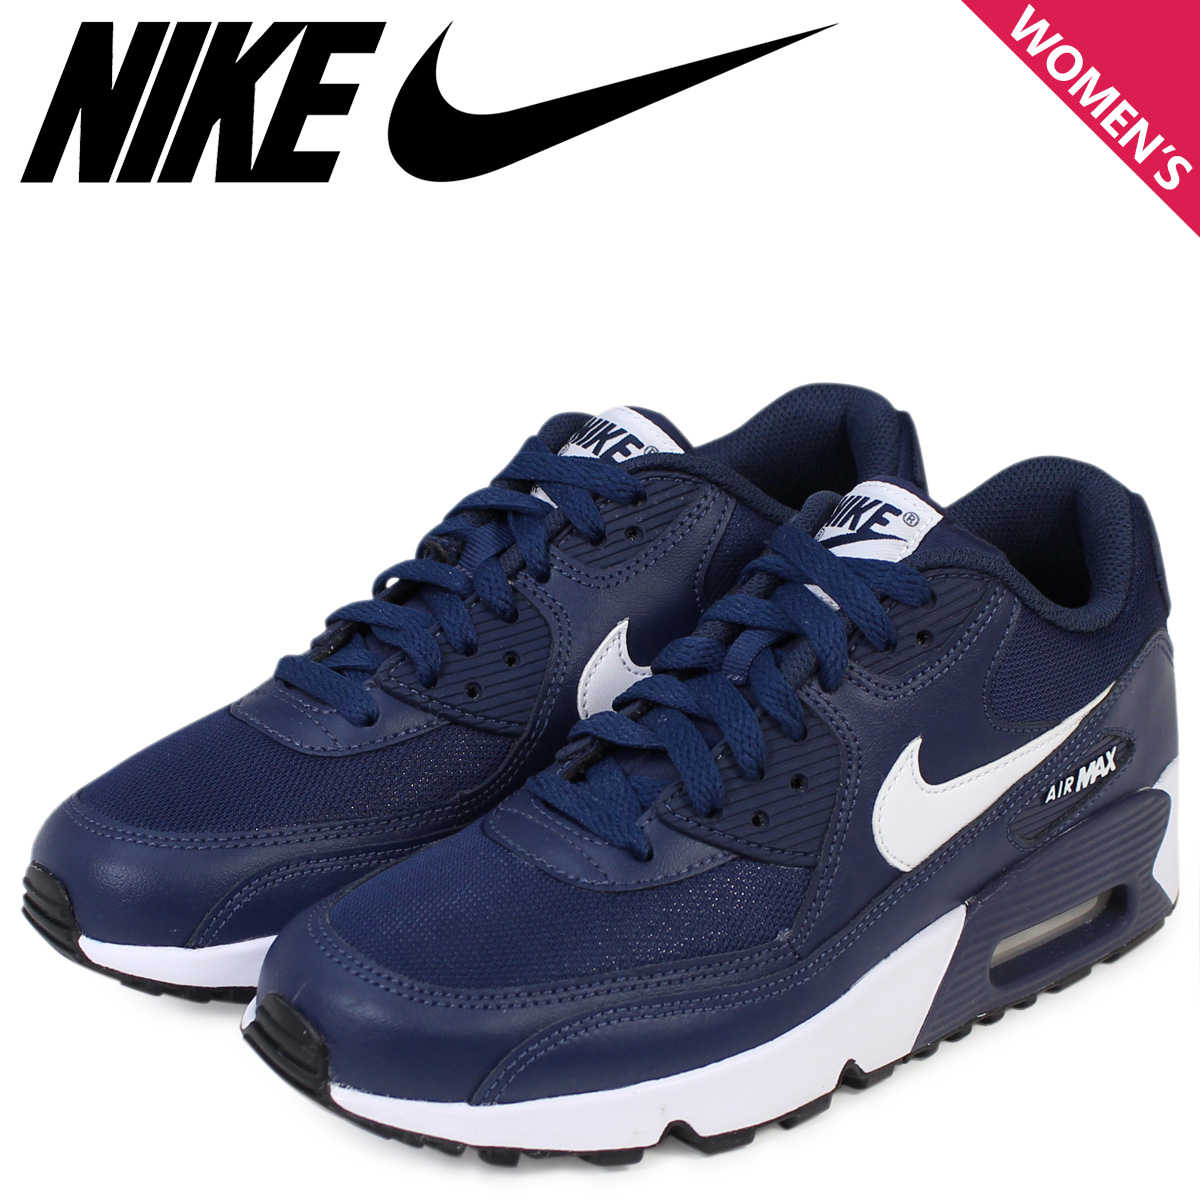 NIKE Air Max Lady's Nike sneakers AIR MAX 90 MESH GS Air Max 833,418 400 shoes navy